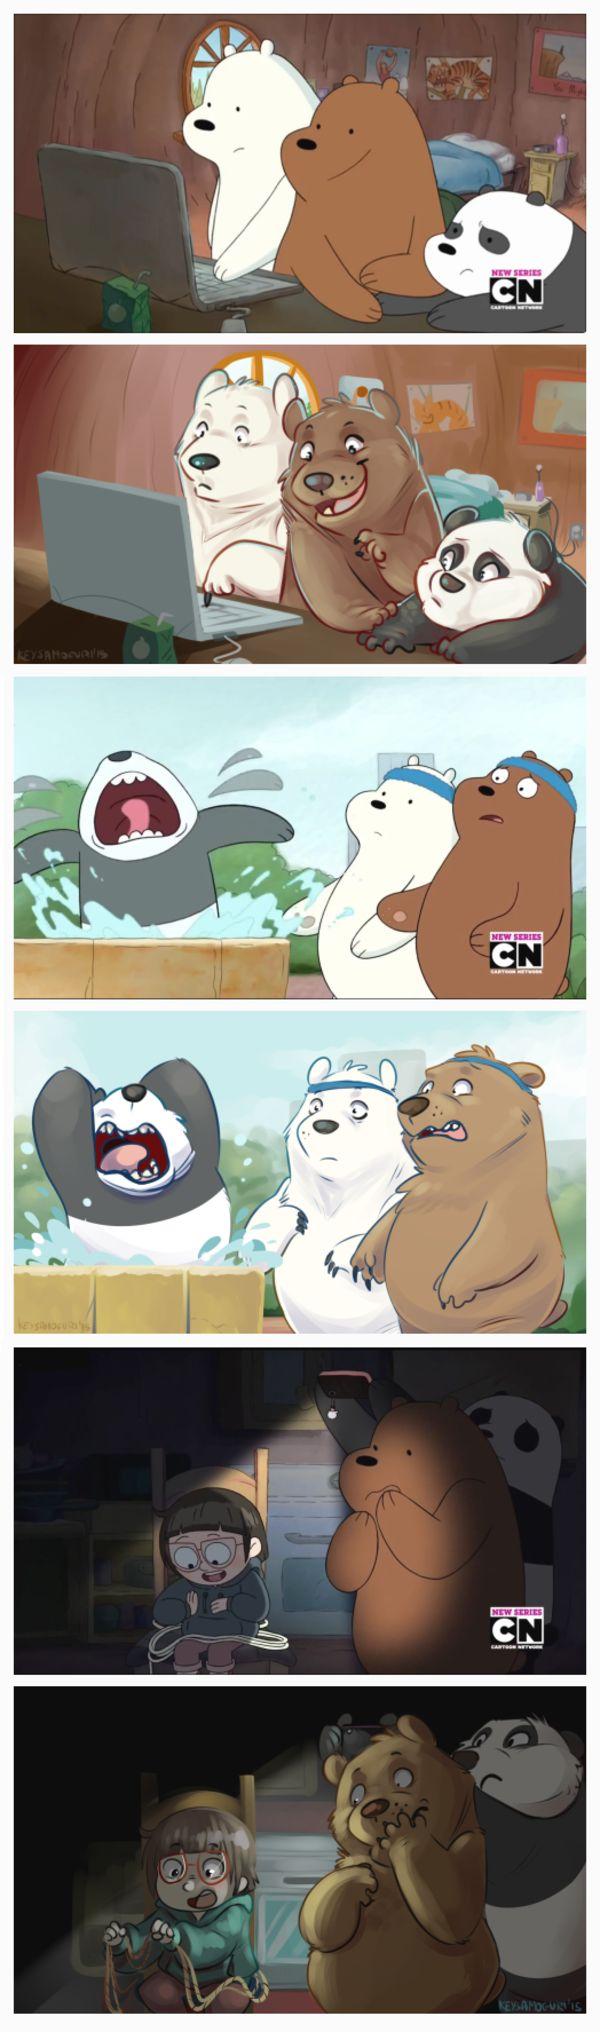 Redrawn screenshots | We Bare Bears | Know Your Meme